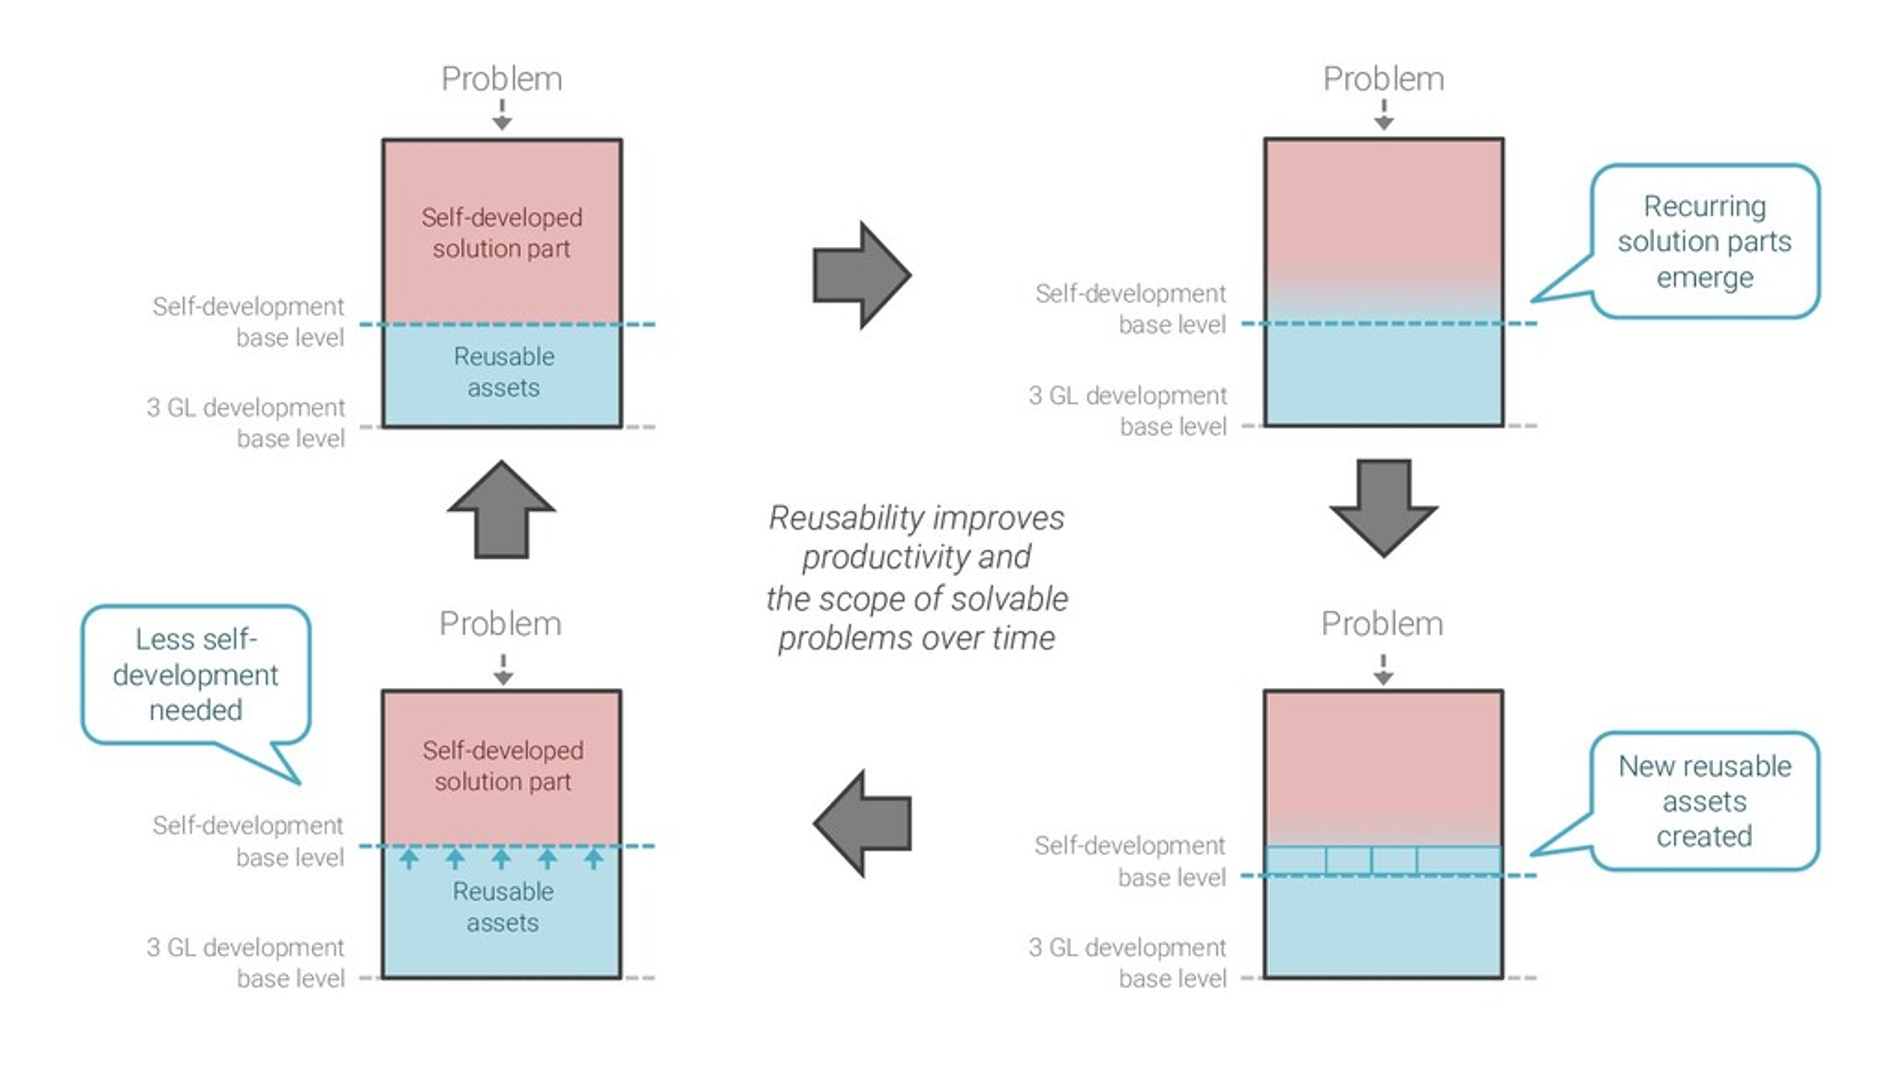 Problem 3 GL development base level Self-develo...